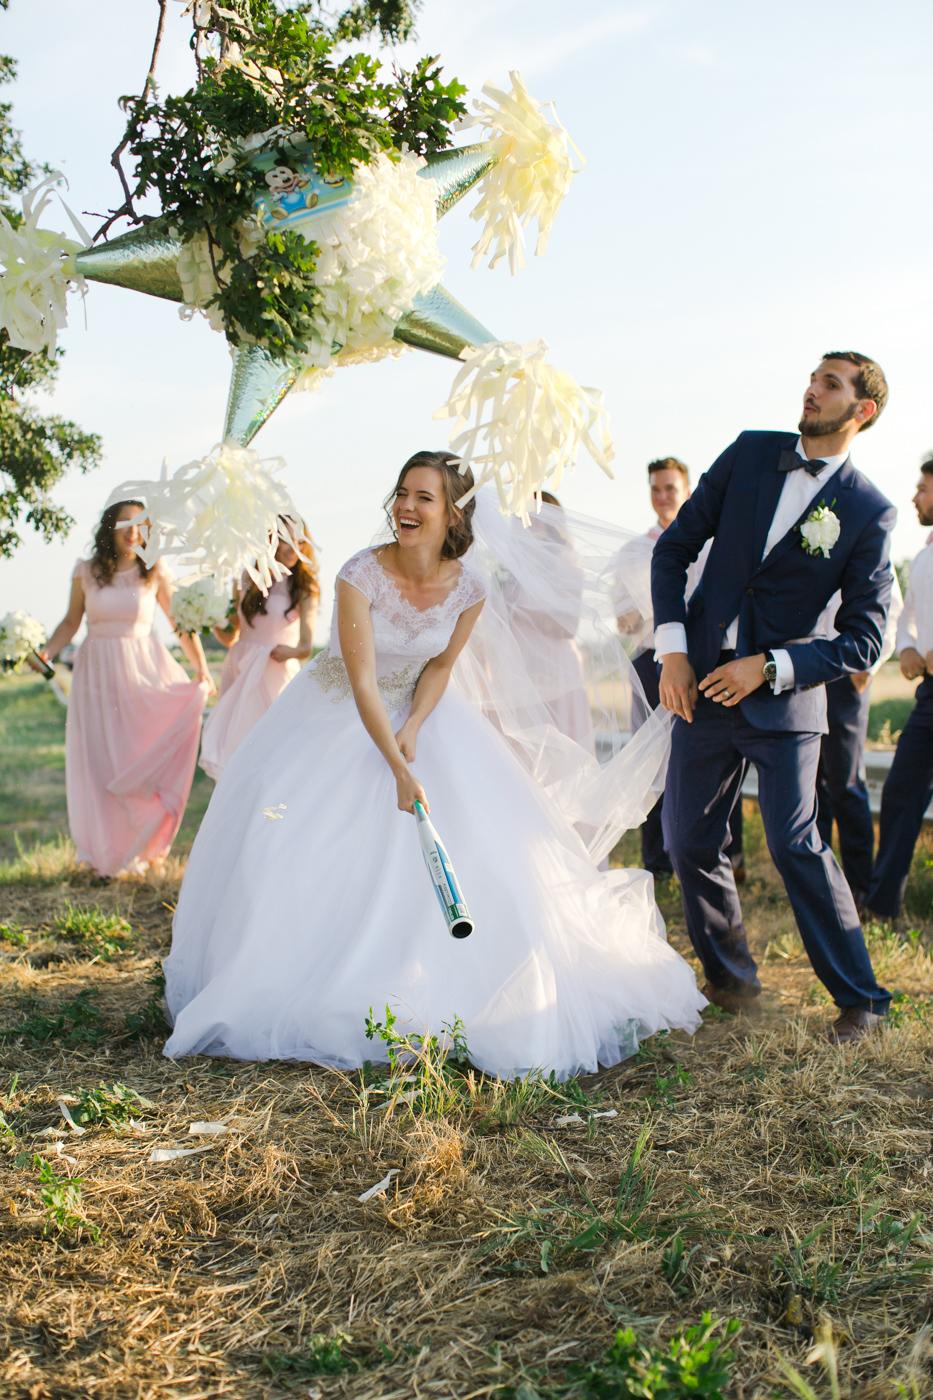 bride-groom-wedding-pinata-fun-west-sacramento